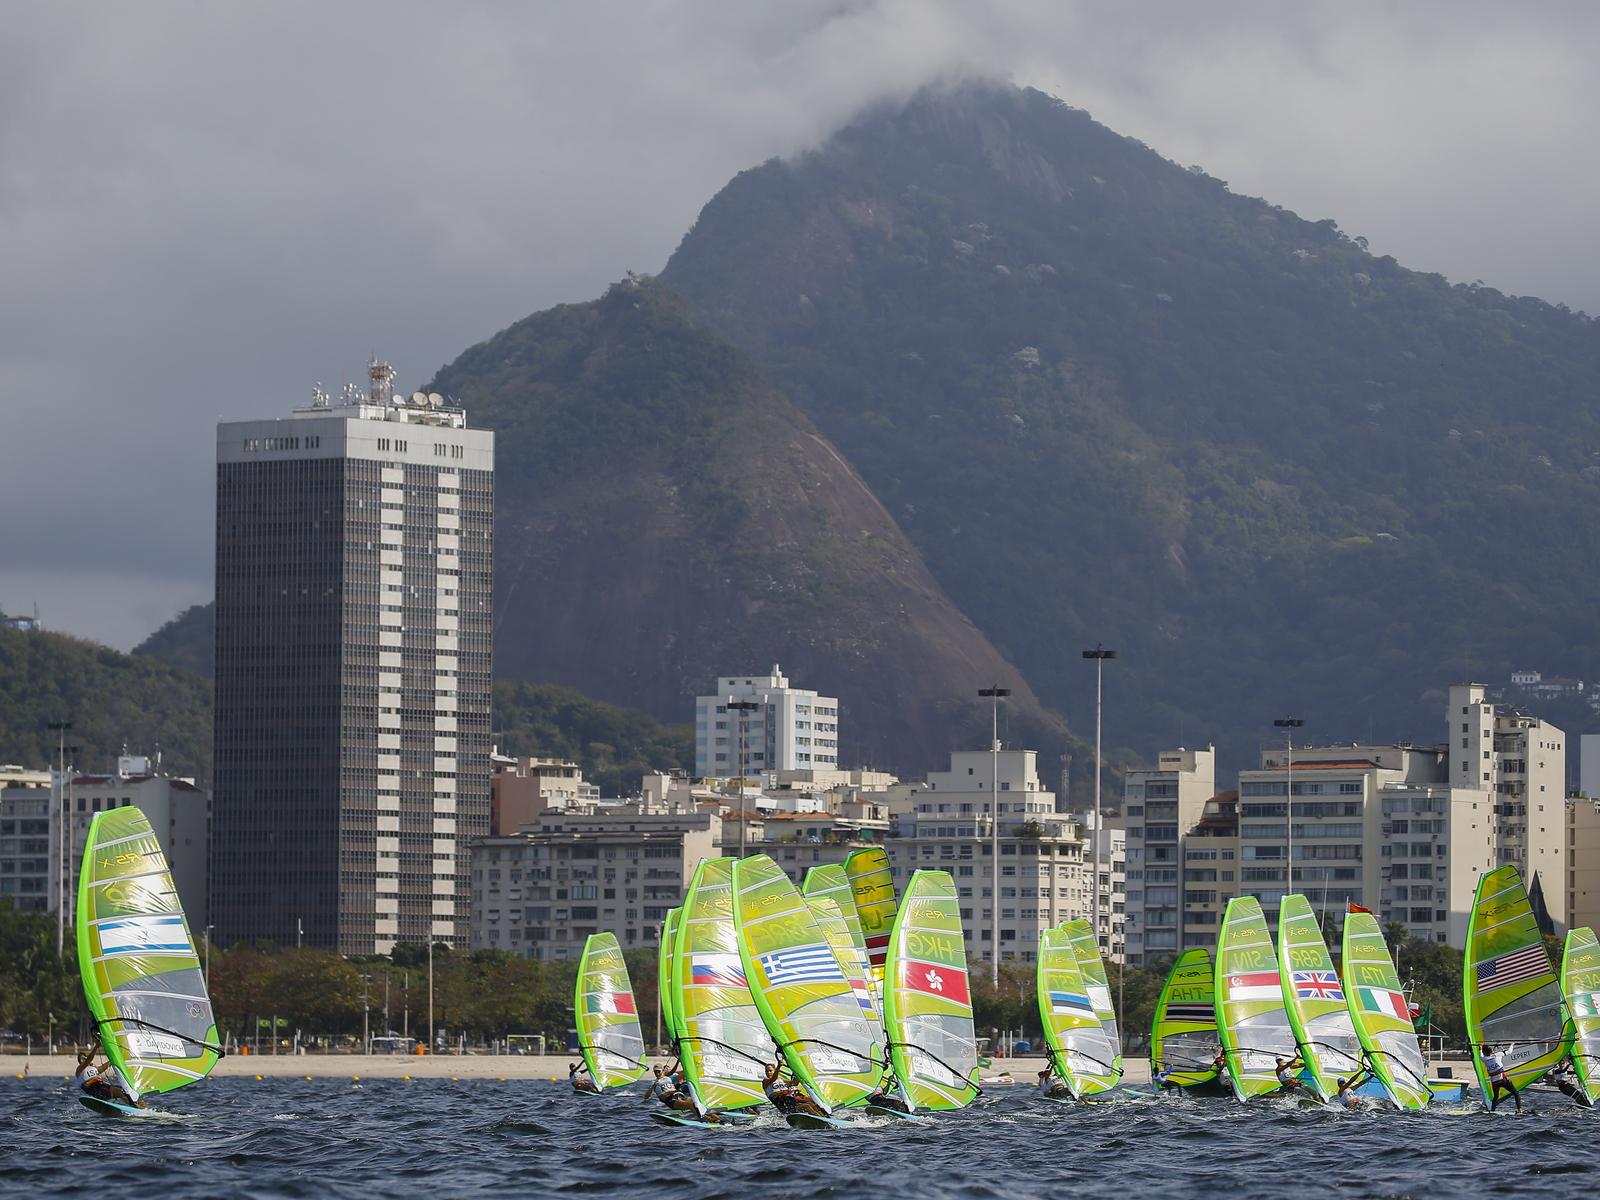 Соревнования виндсерферов в олимпийской бухте